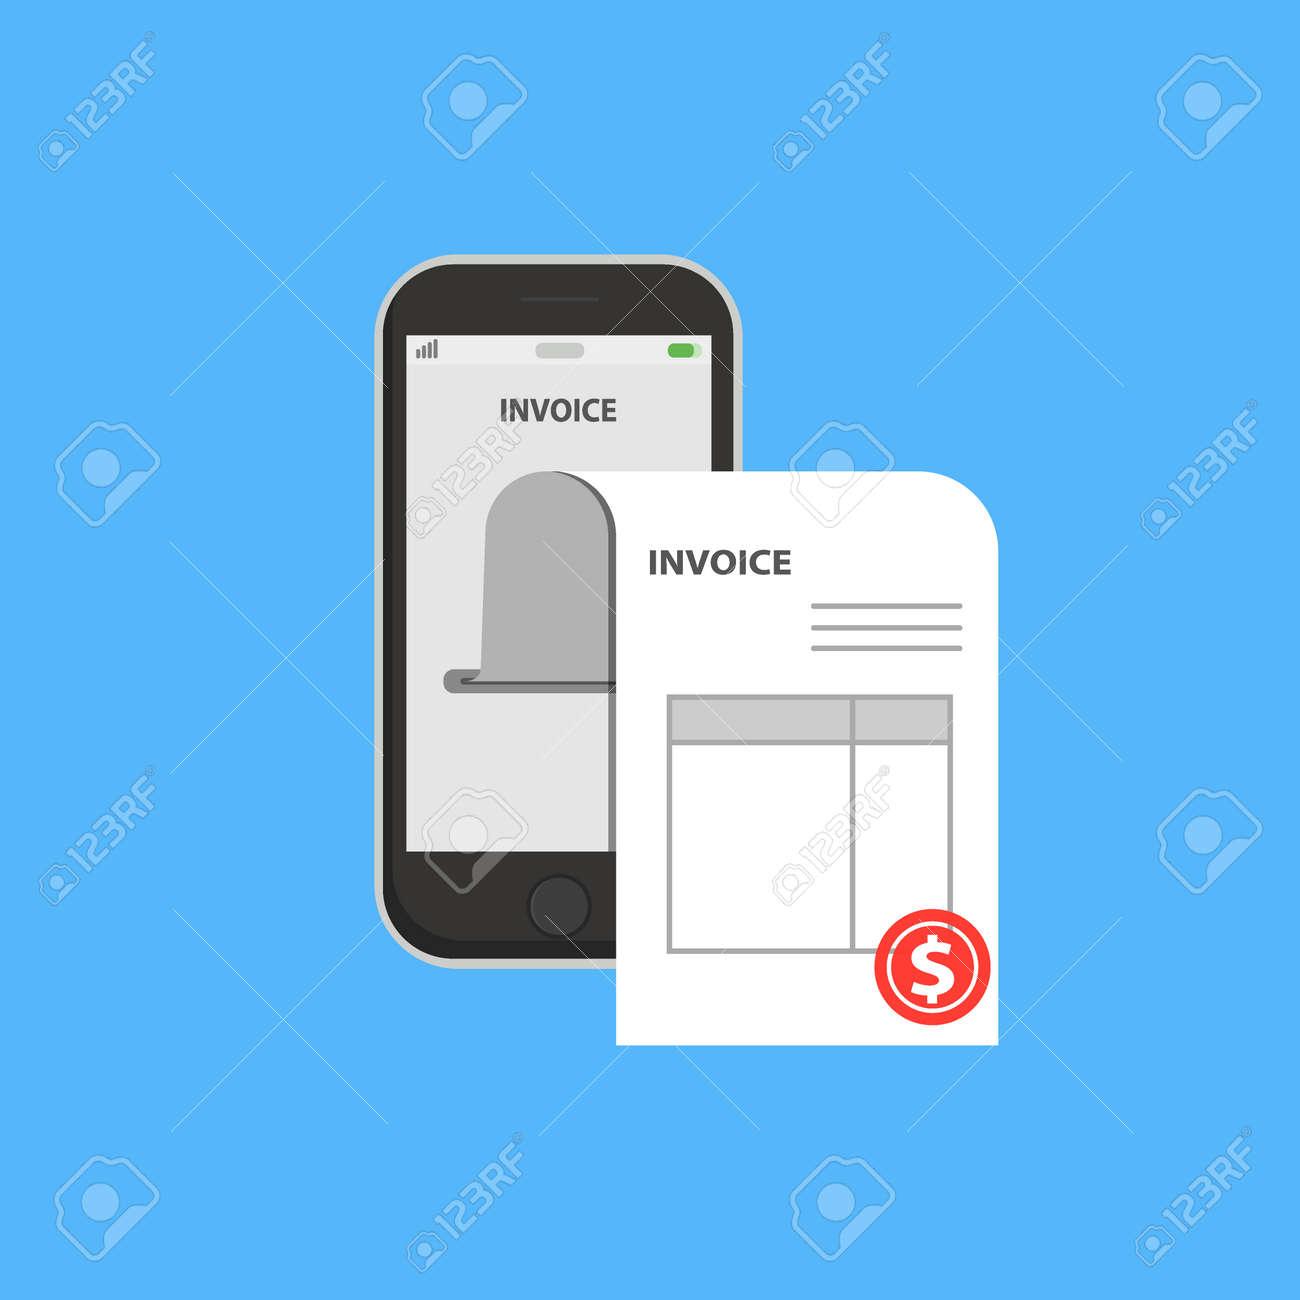 Invoice Bill In Smartphone Concept Vector Illustration Flat - Mobile phone invoice